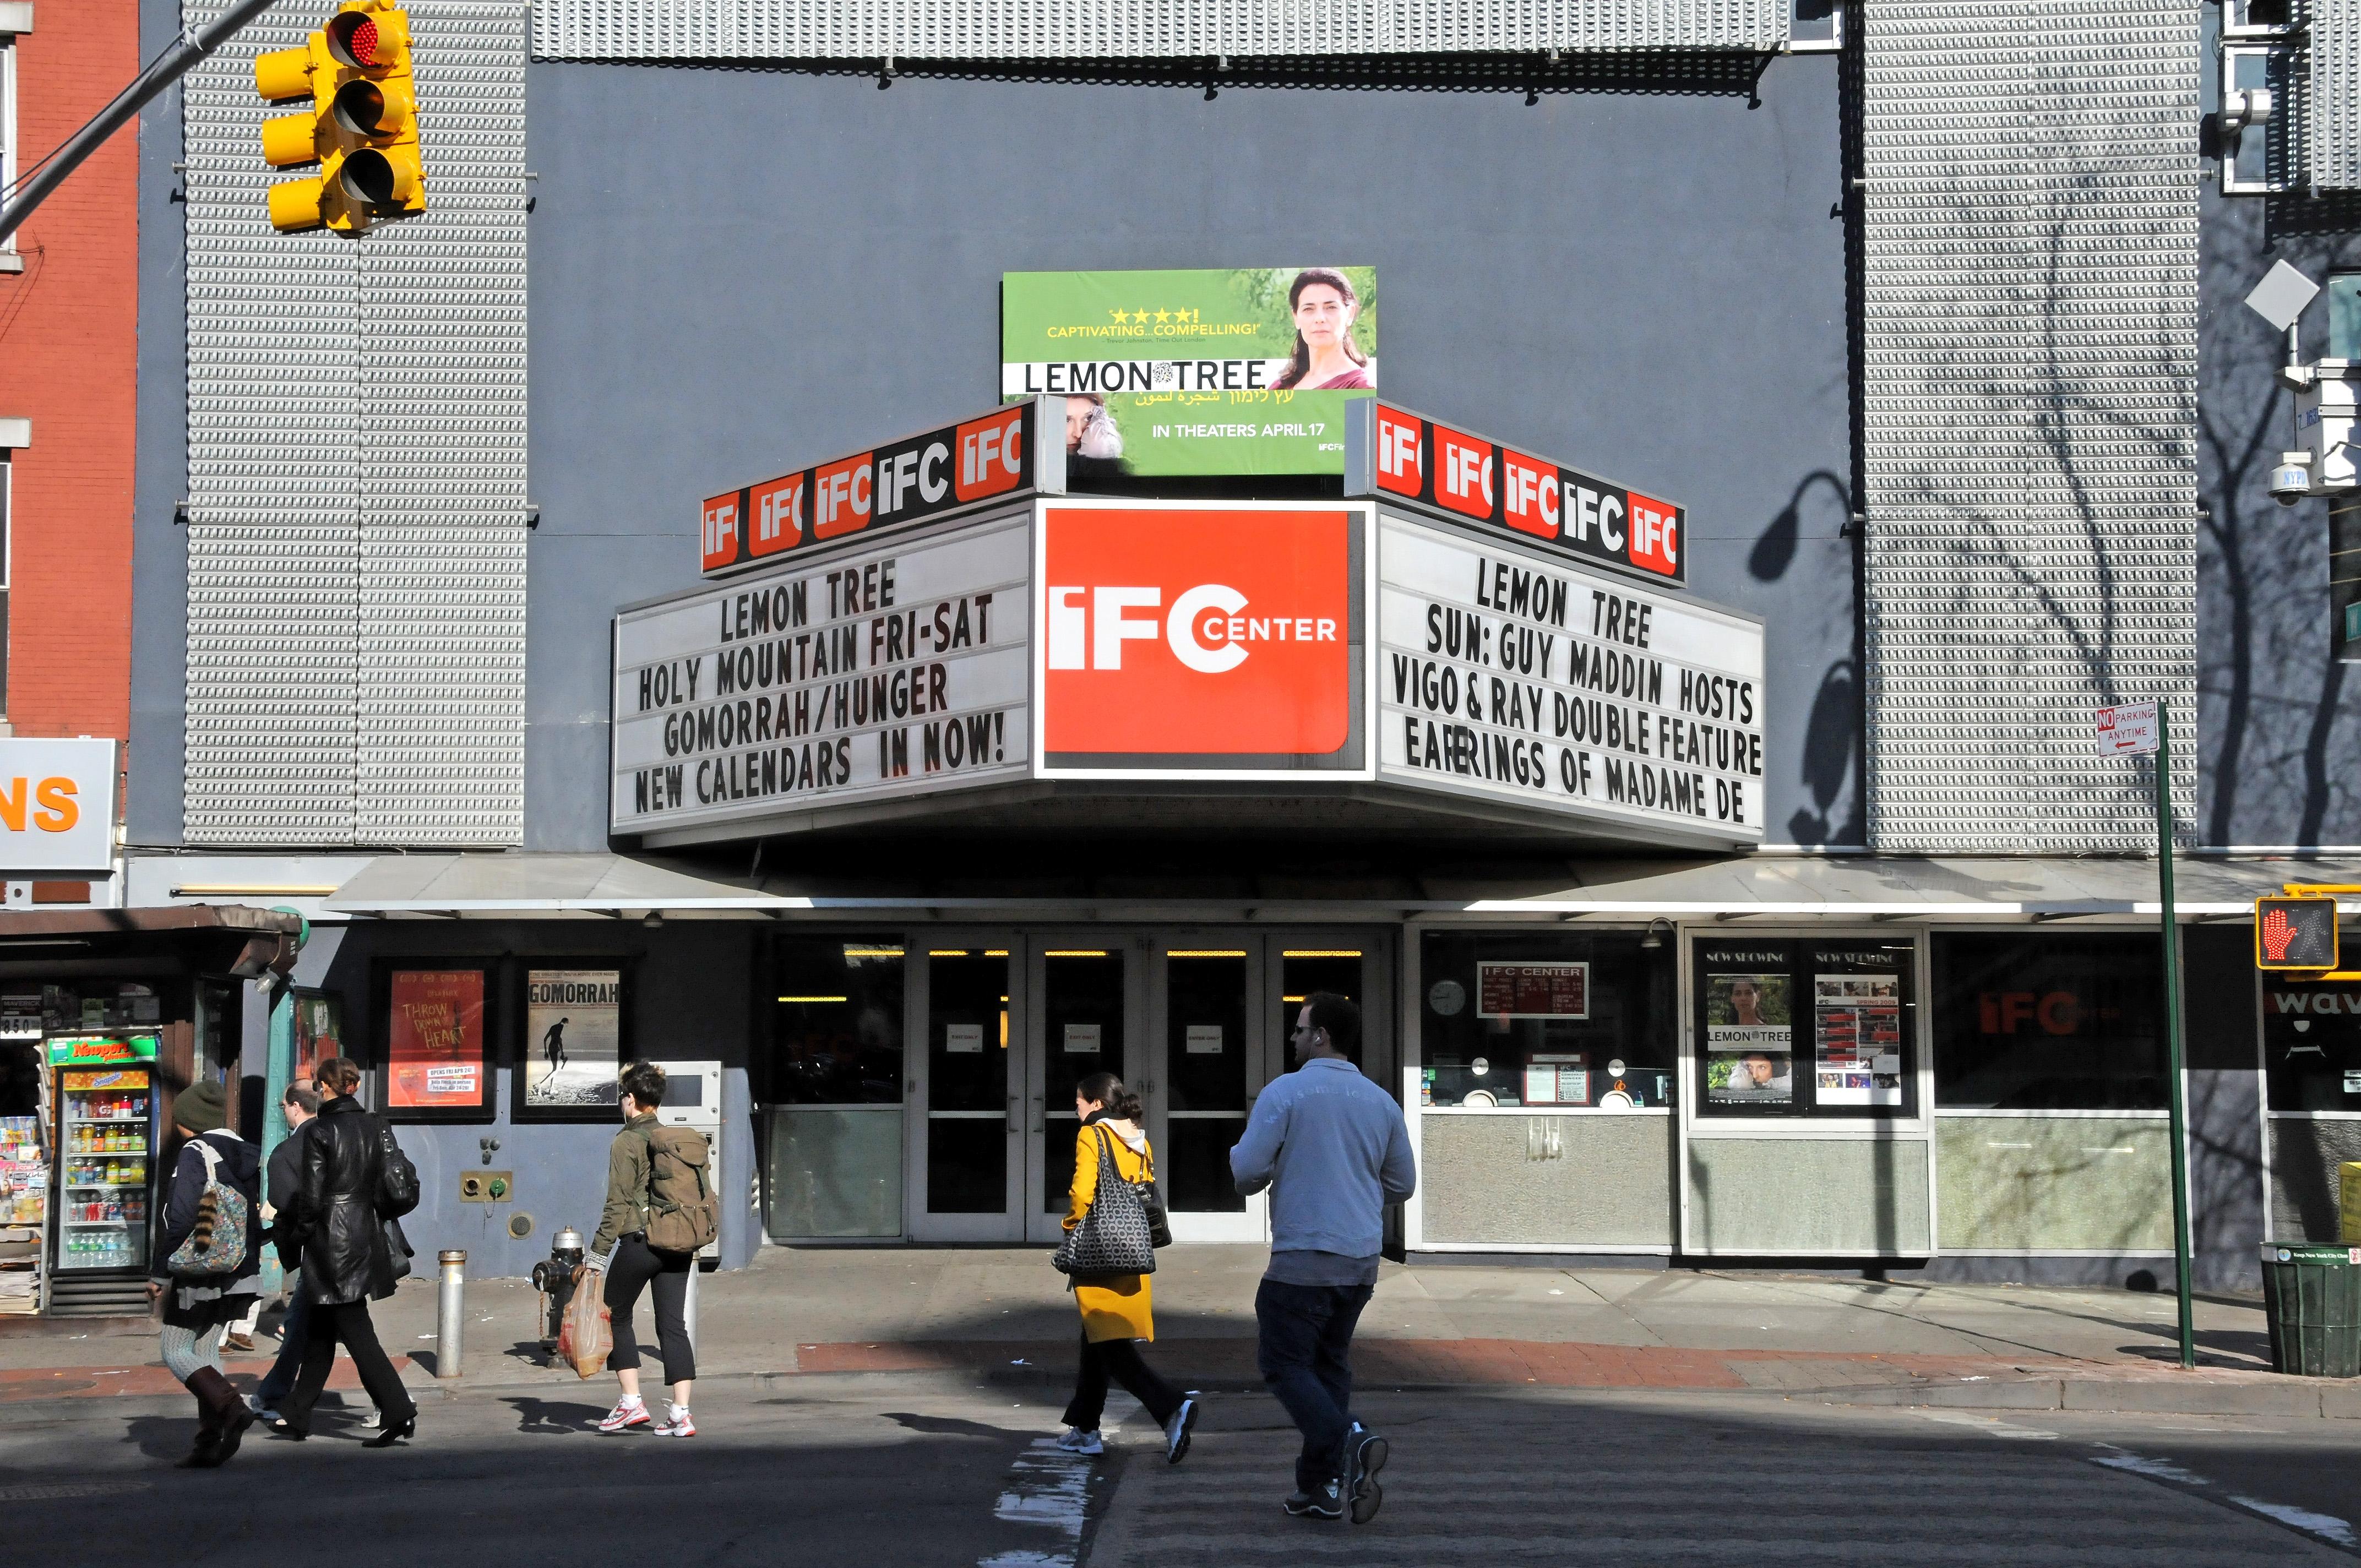 Independent Film Center